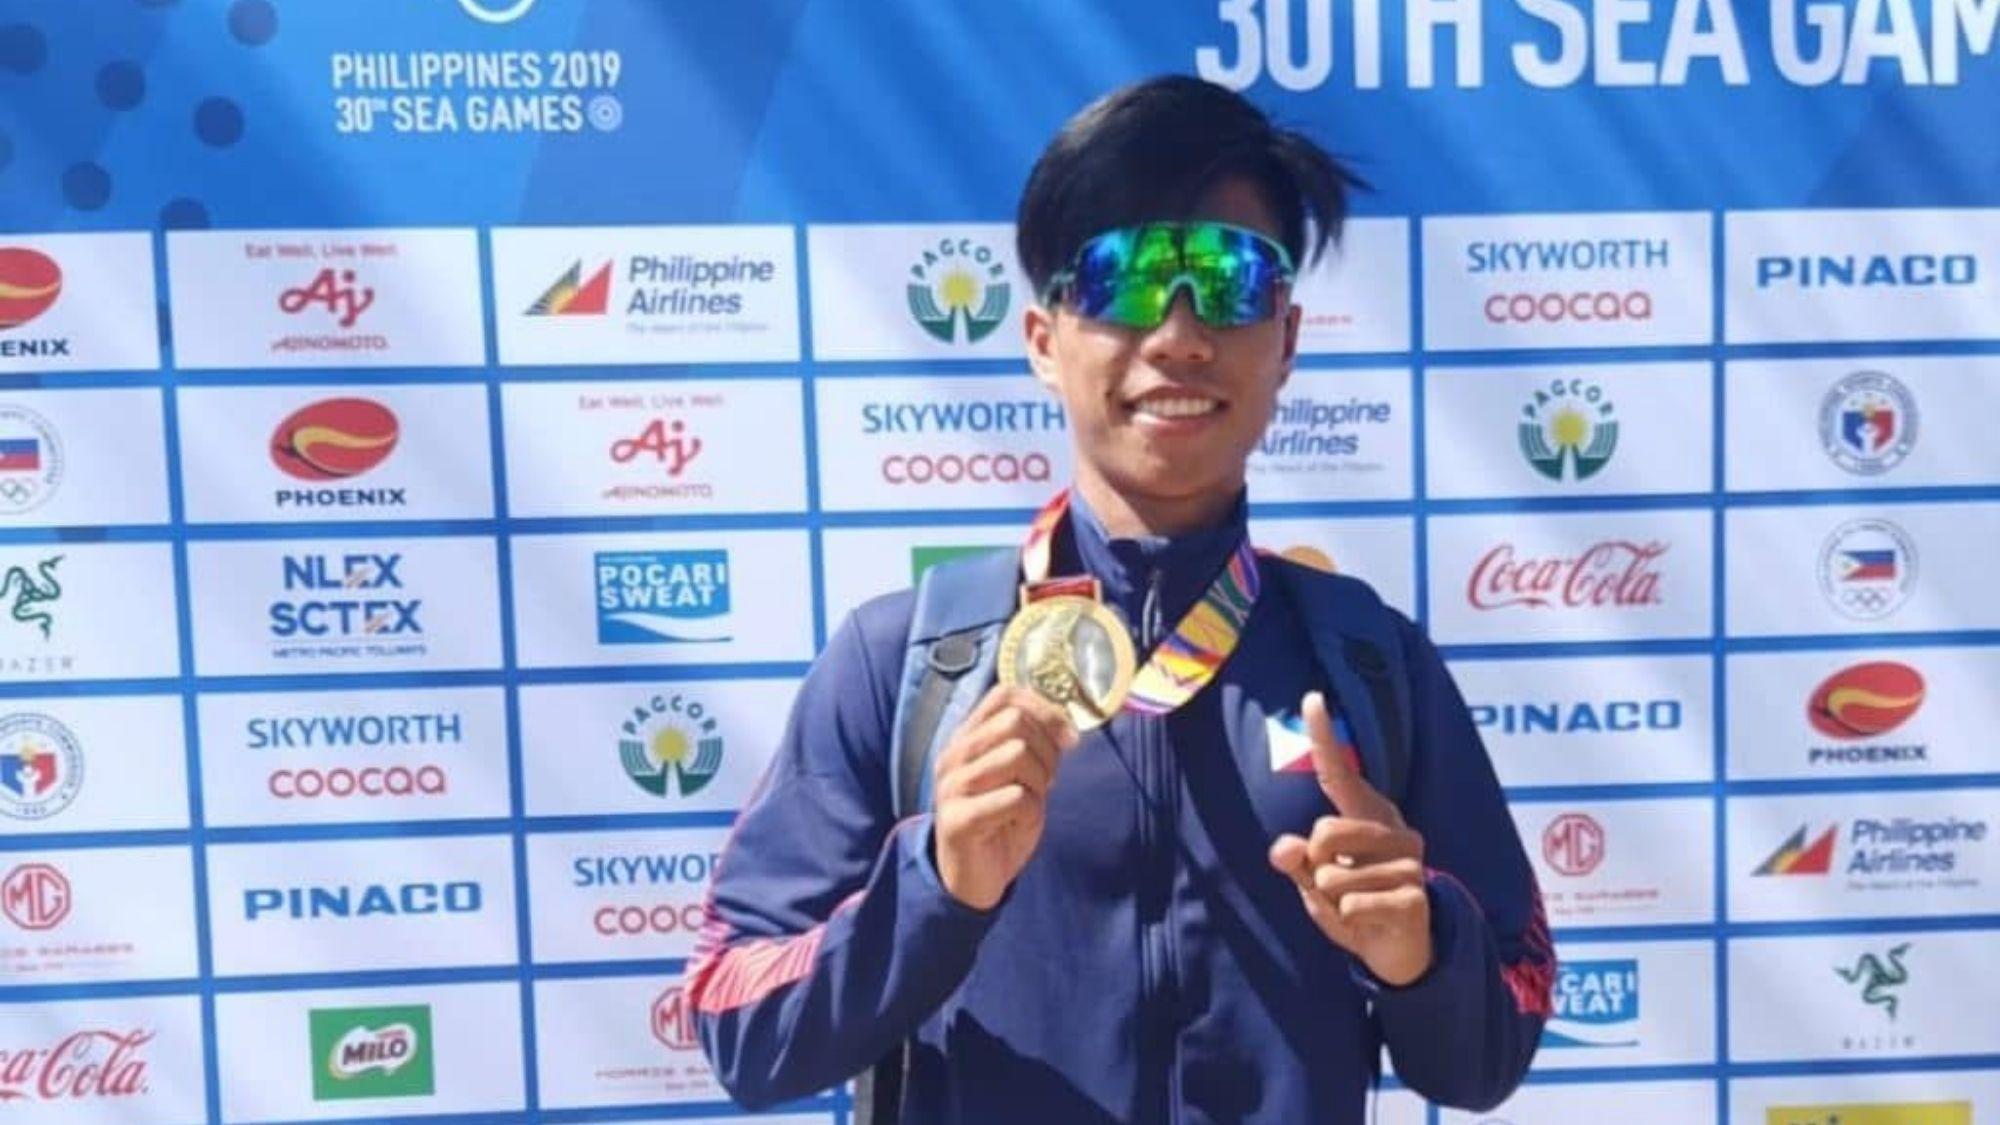 PH rower Cris Nieveraz headed to Tokyo Olympics